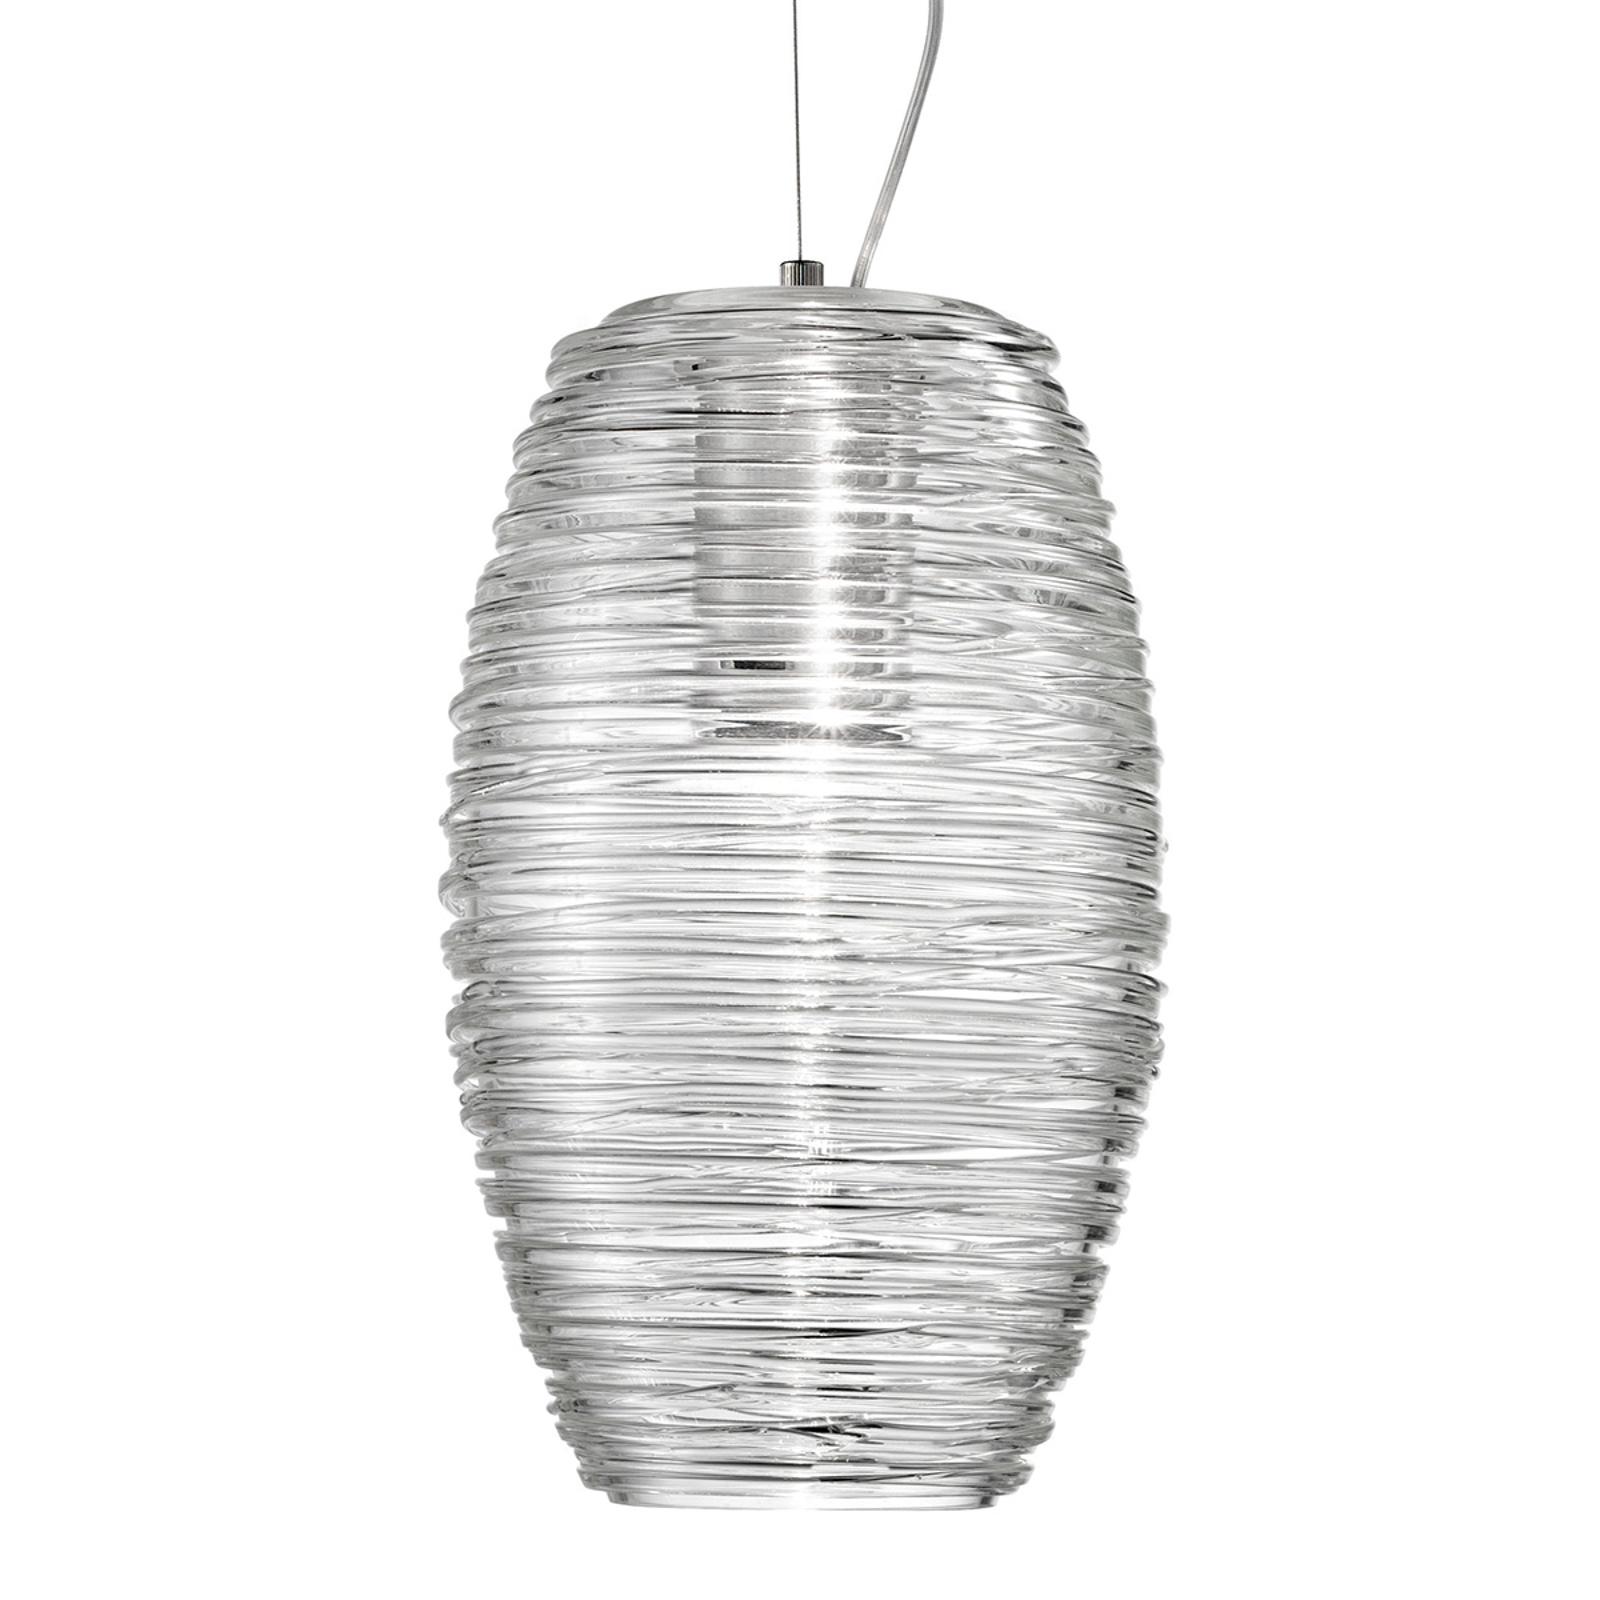 Suspension LED Damasco transparente Ø 15cm